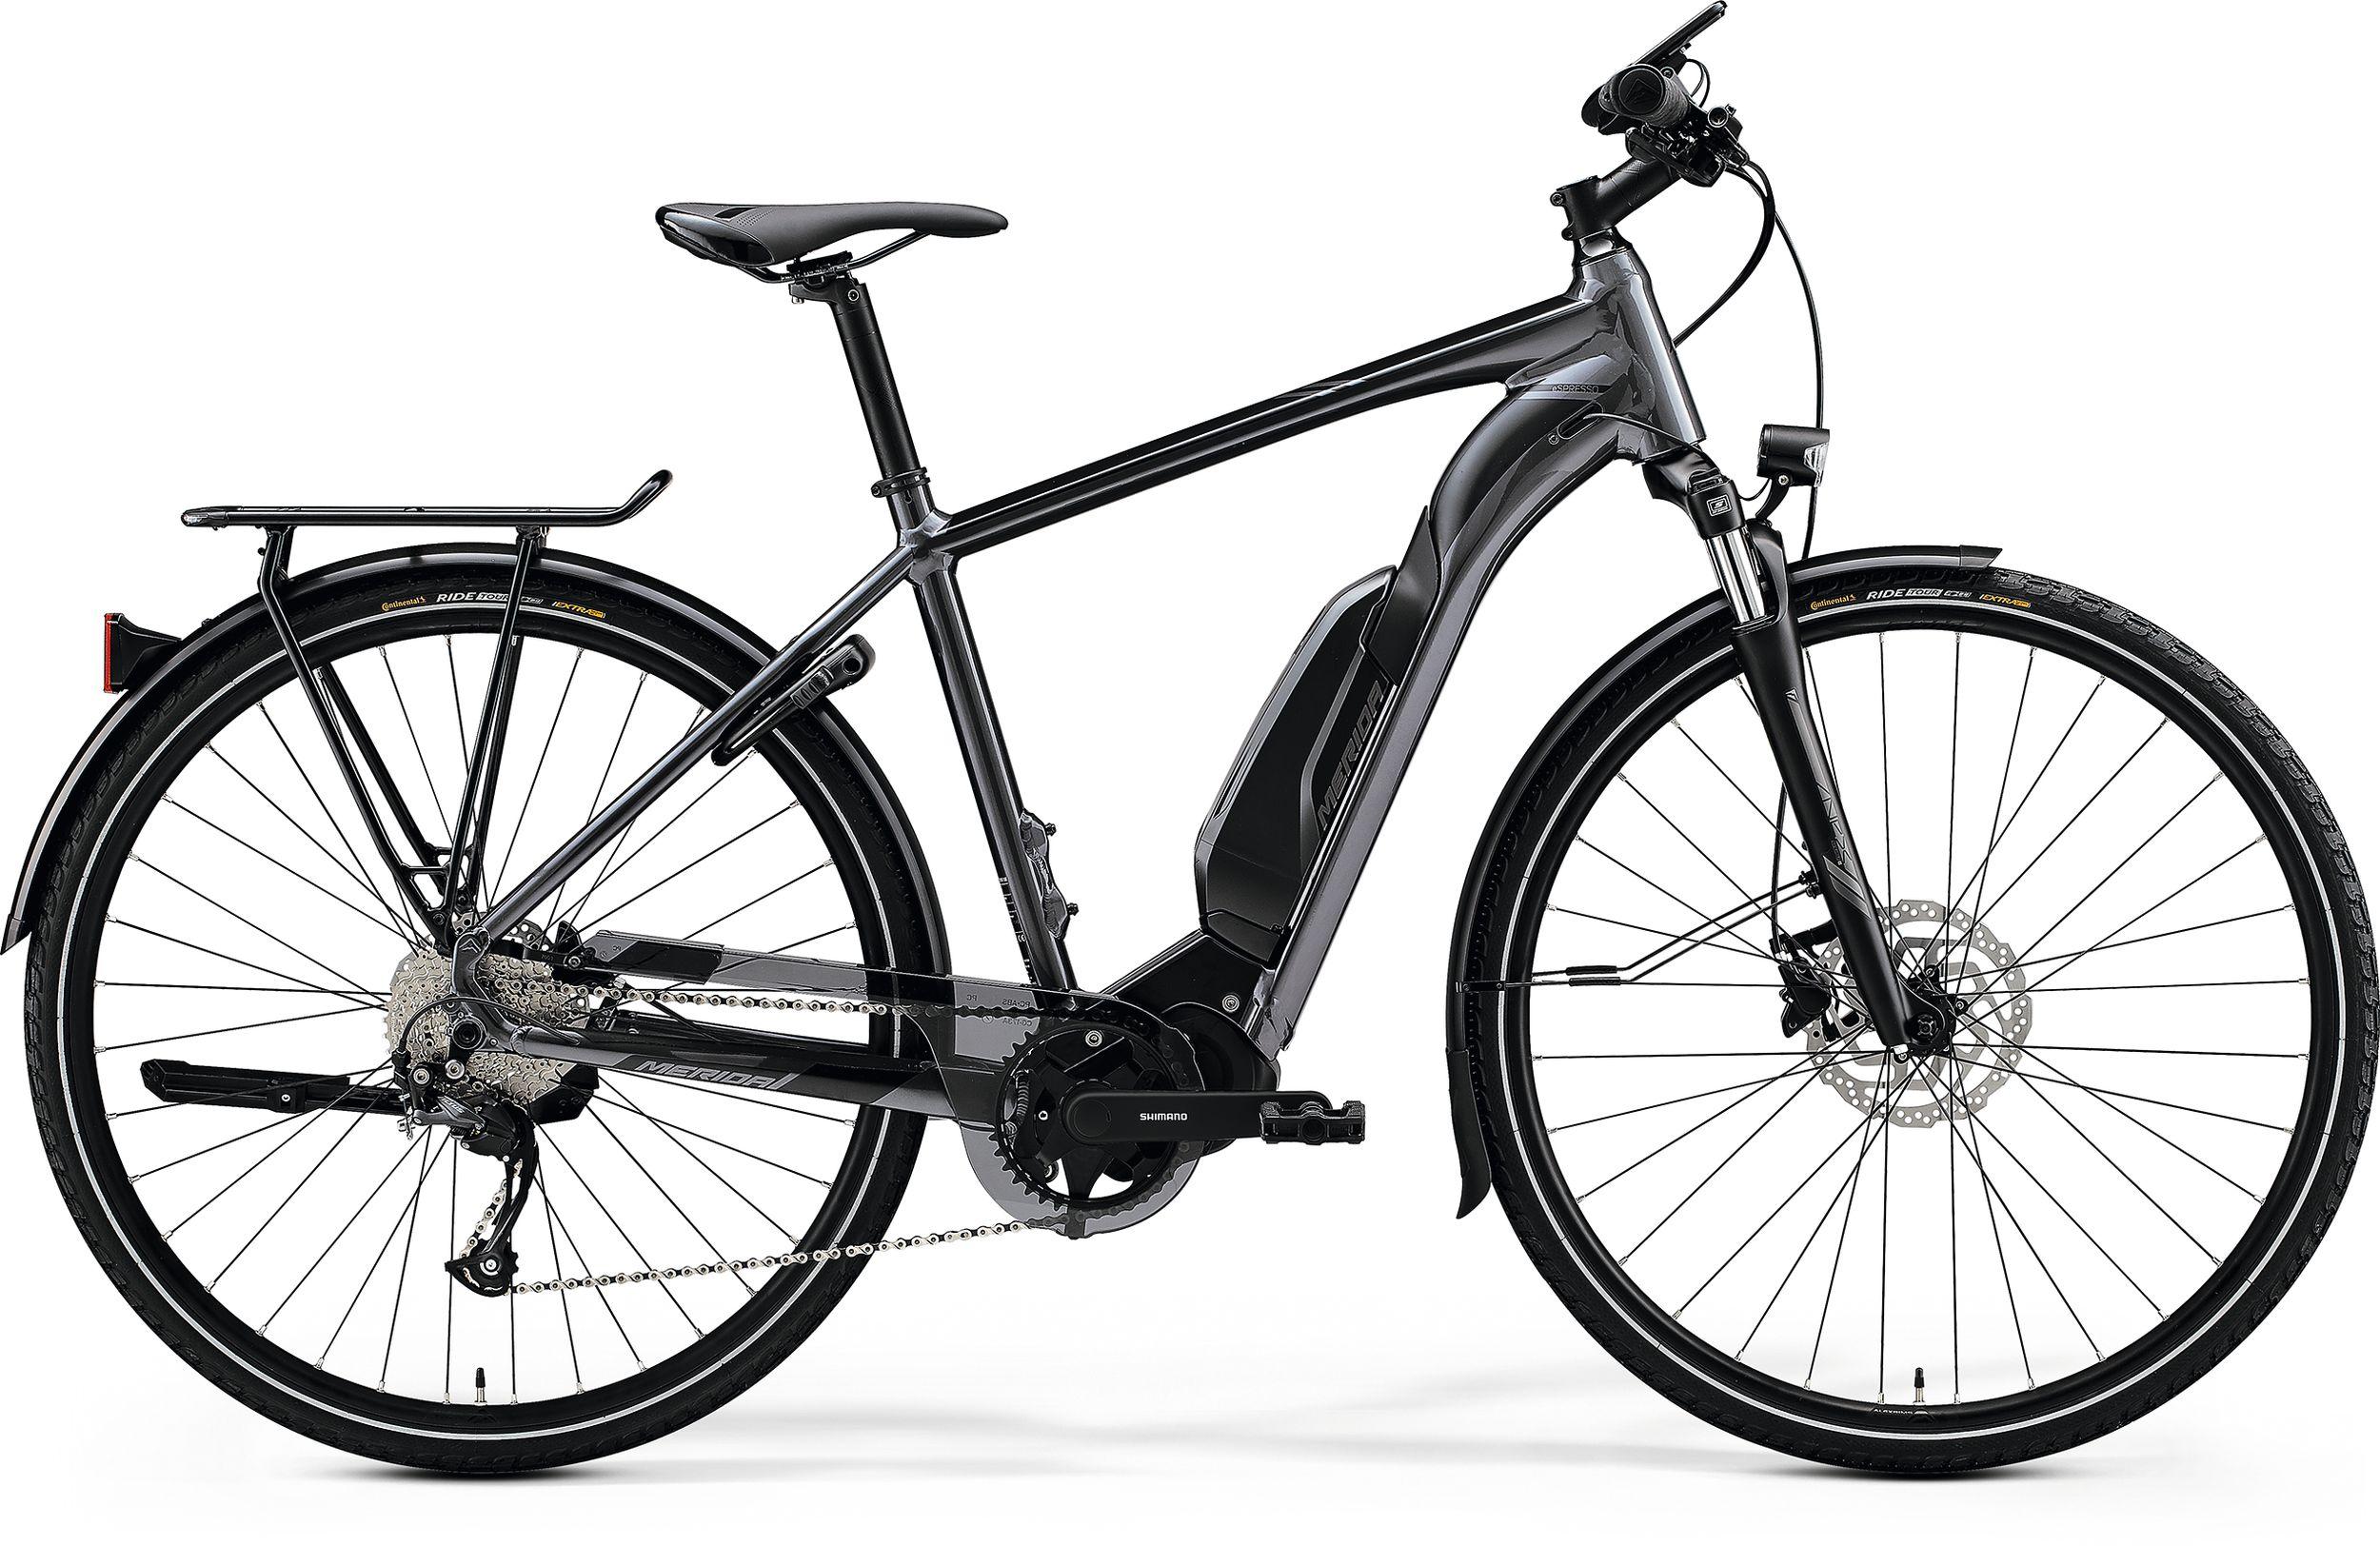 VB SHIMANO Bicycle Bike 7-Speed Freewheel Cassette Gear SINGAPOPORE